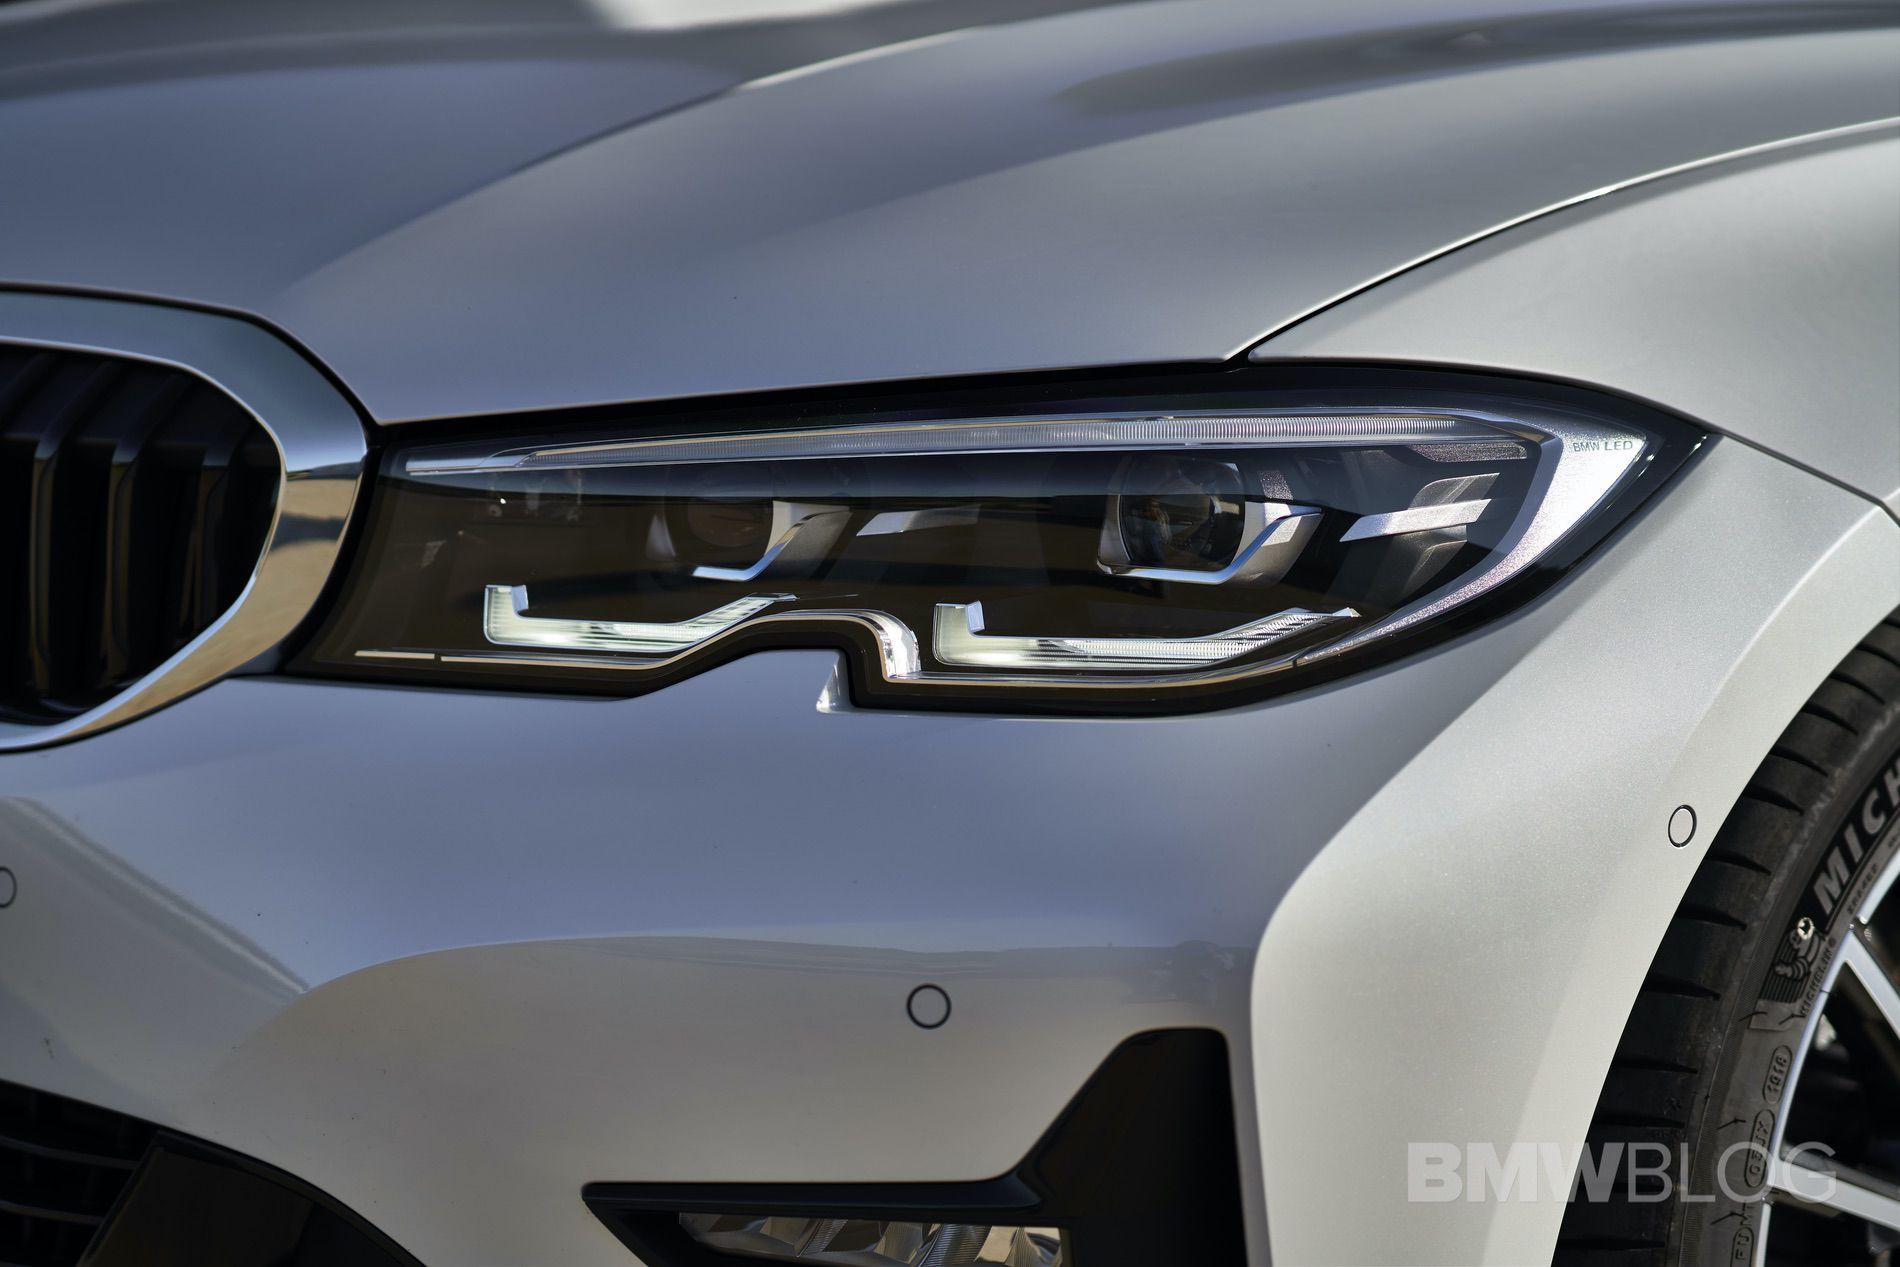 2019-BMW-320d-G20-test-drive-06.jpg